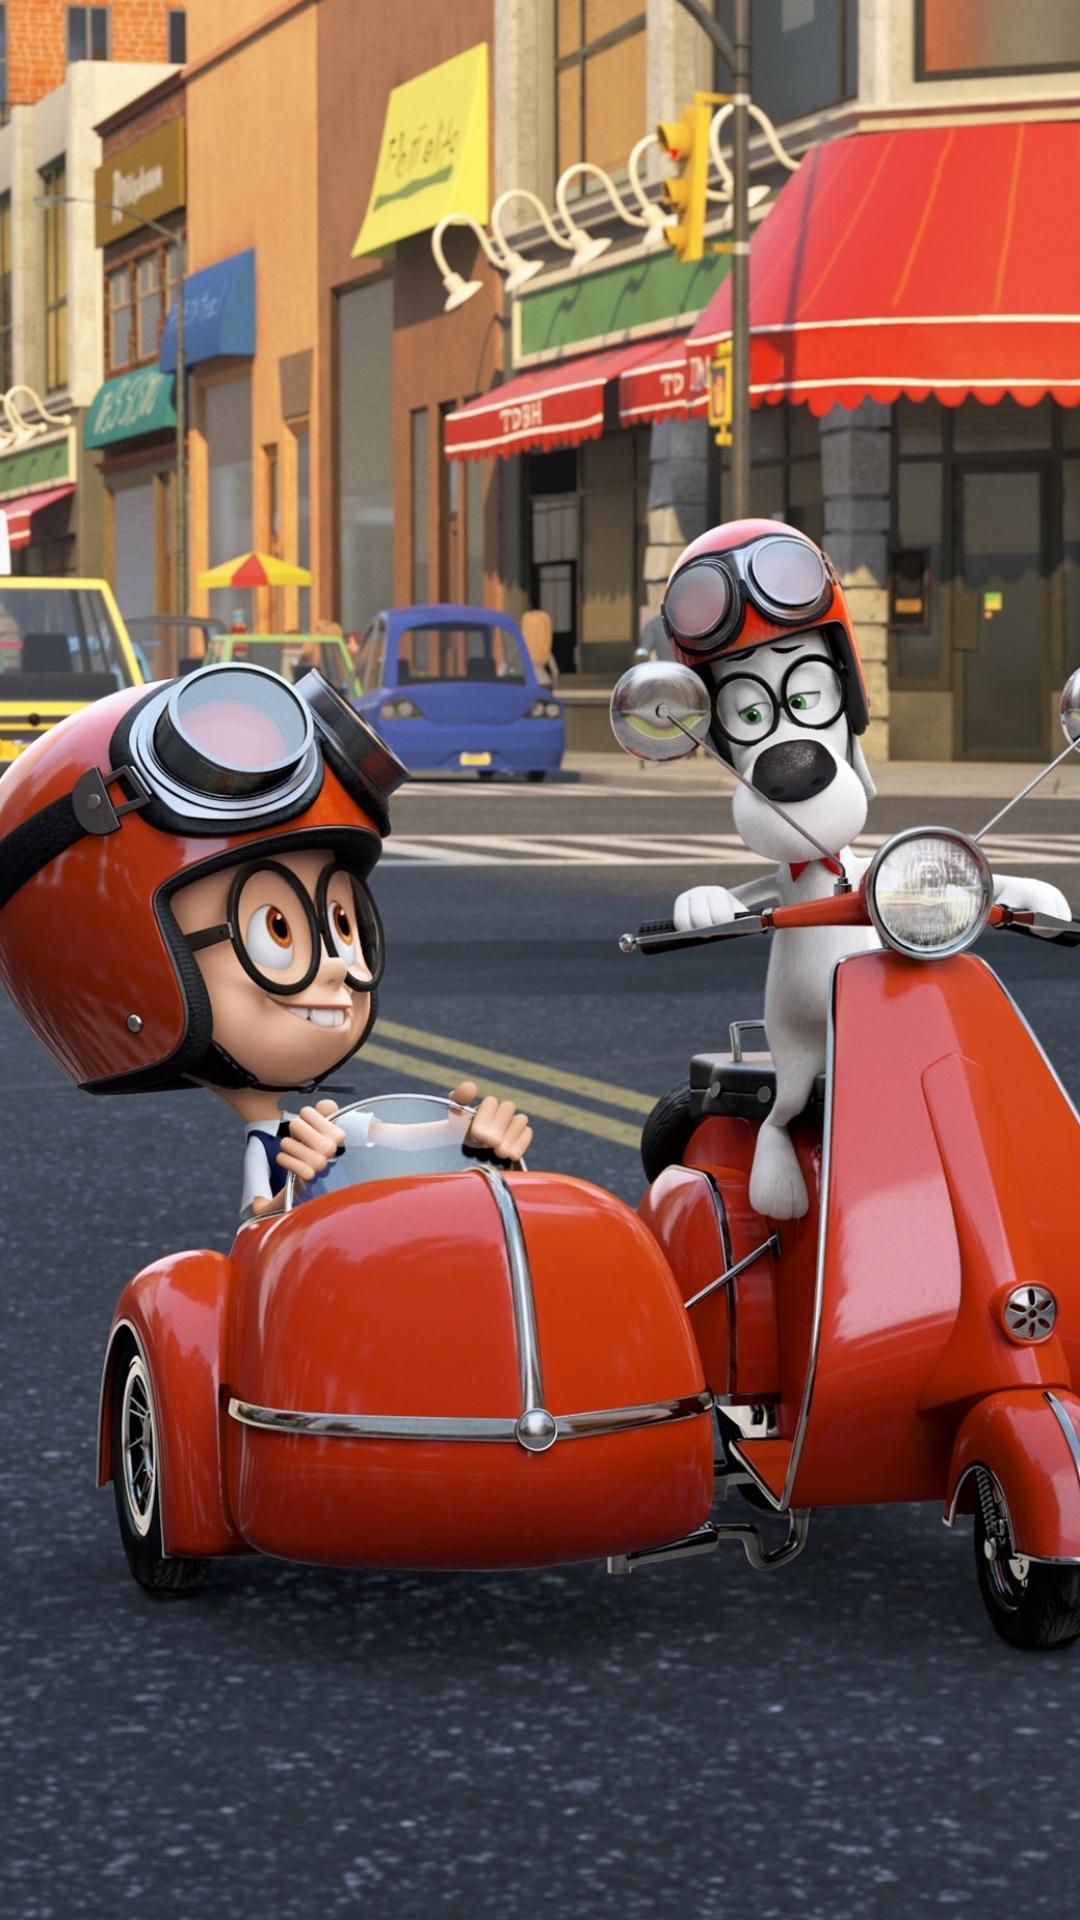 Movie Mr Peabody Sherman 1080x1920 Wallpaper Id 377716